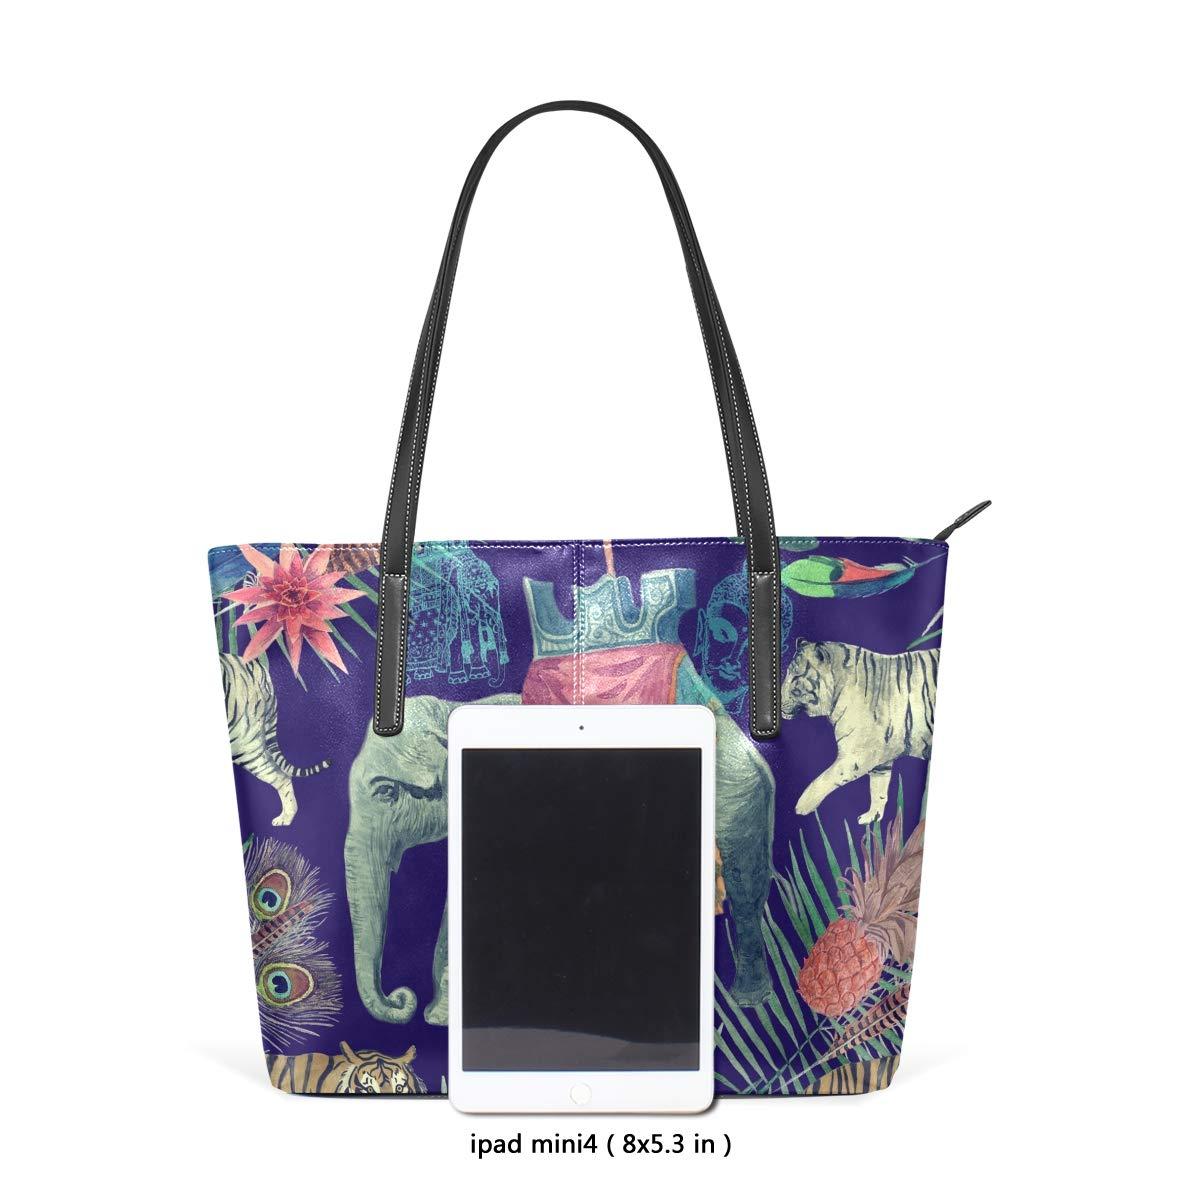 AMONKA , Damen Tote-Tasche Tote-Tasche Tote-Tasche Mehrfarbig mehrfarbig Large B07Q12RFG7 Shopper Feines Nähen 3e0441